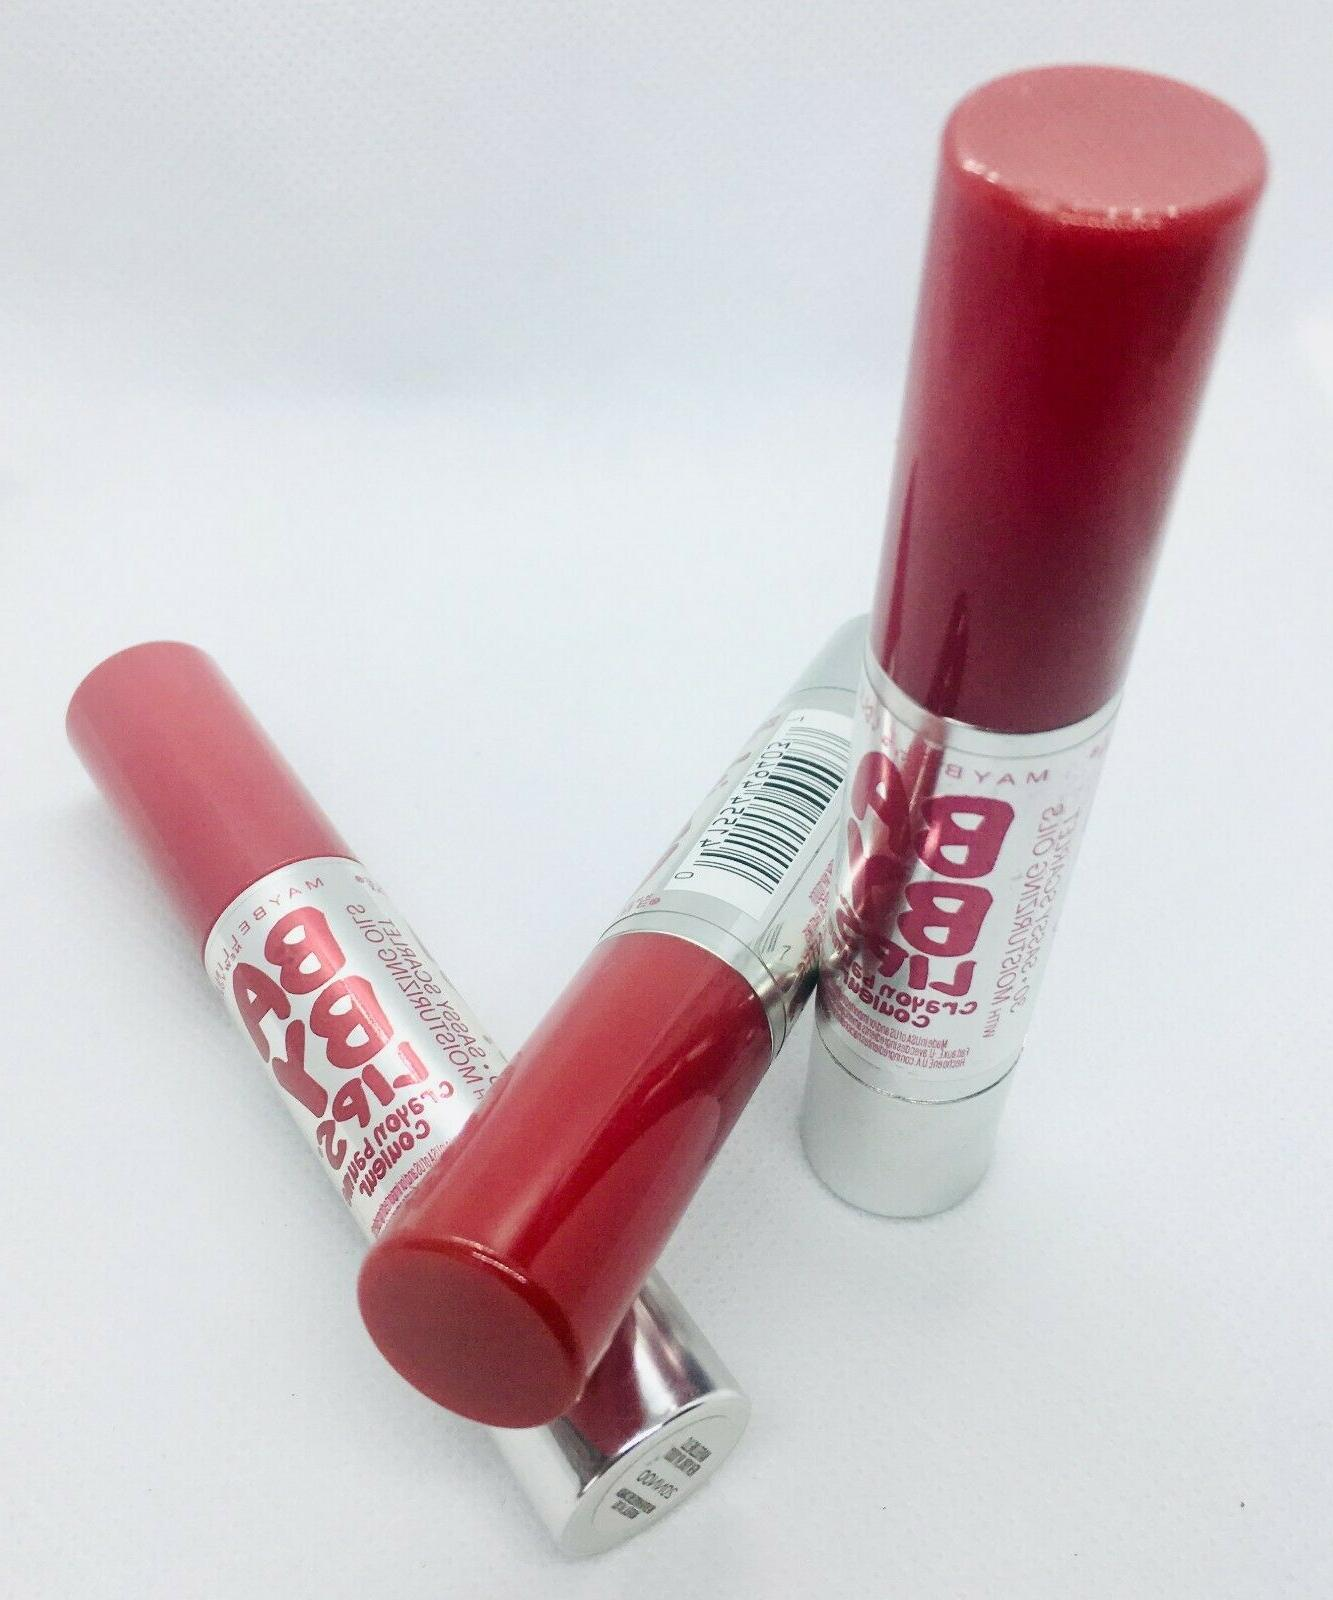 maybelline baby lips color balm crayon 30